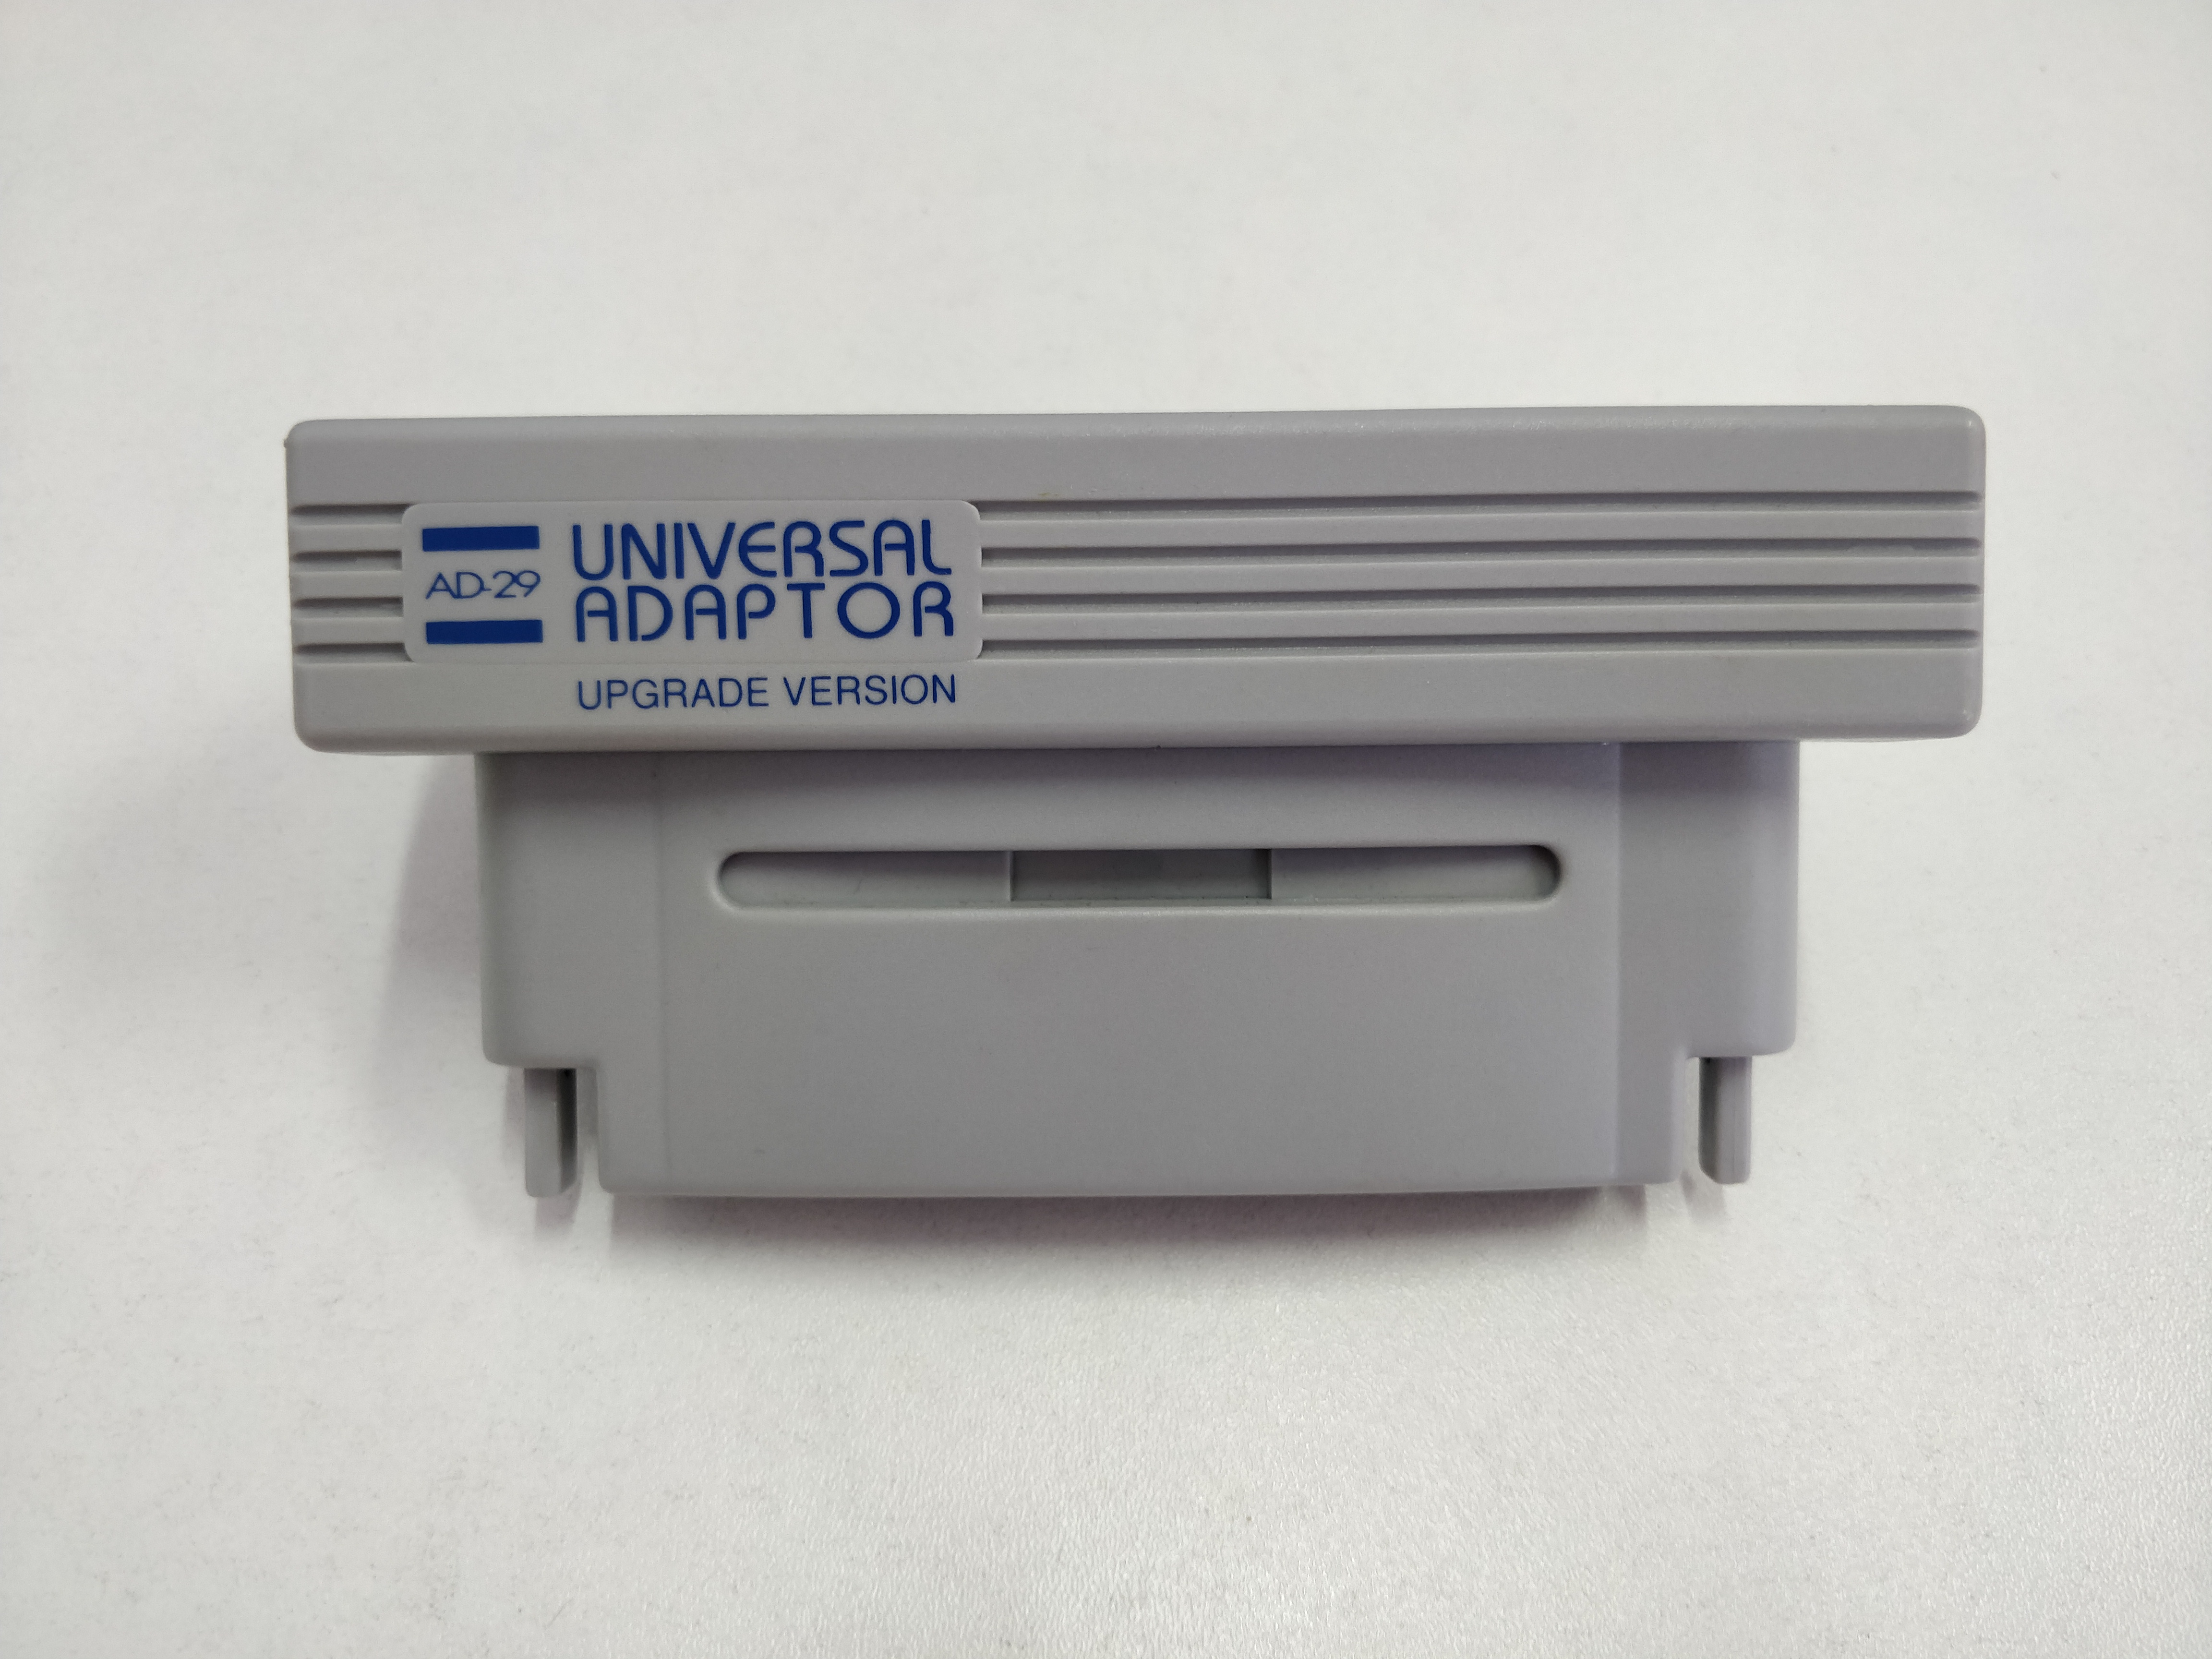 [Nintendo SNES] AD-29 adaptér pro hry